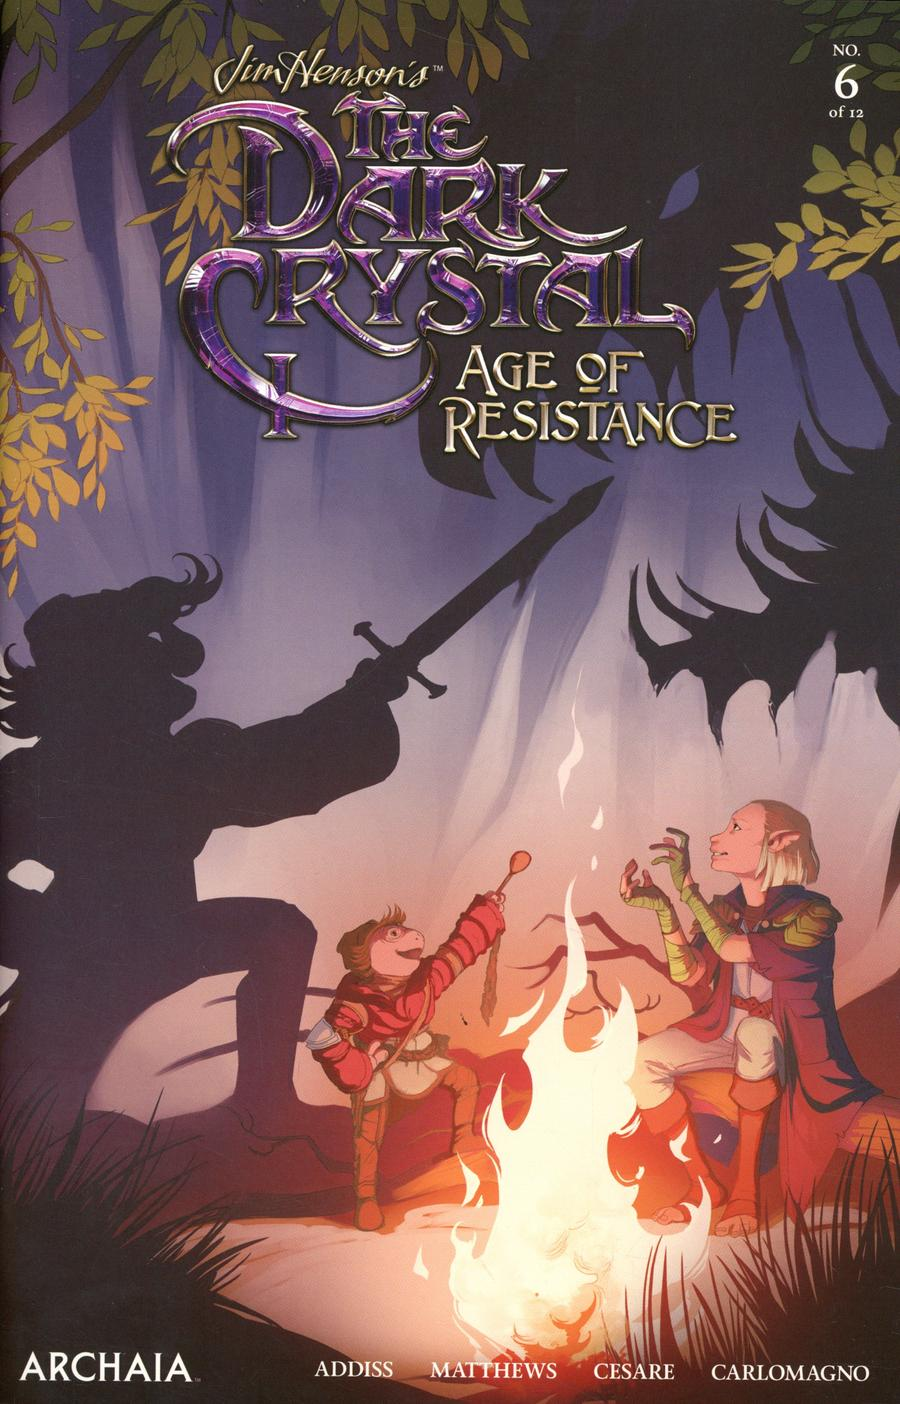 Jim Hensons Dark Crystal Age Of Resistance #6 Cover A Regular Mona Finden Cover